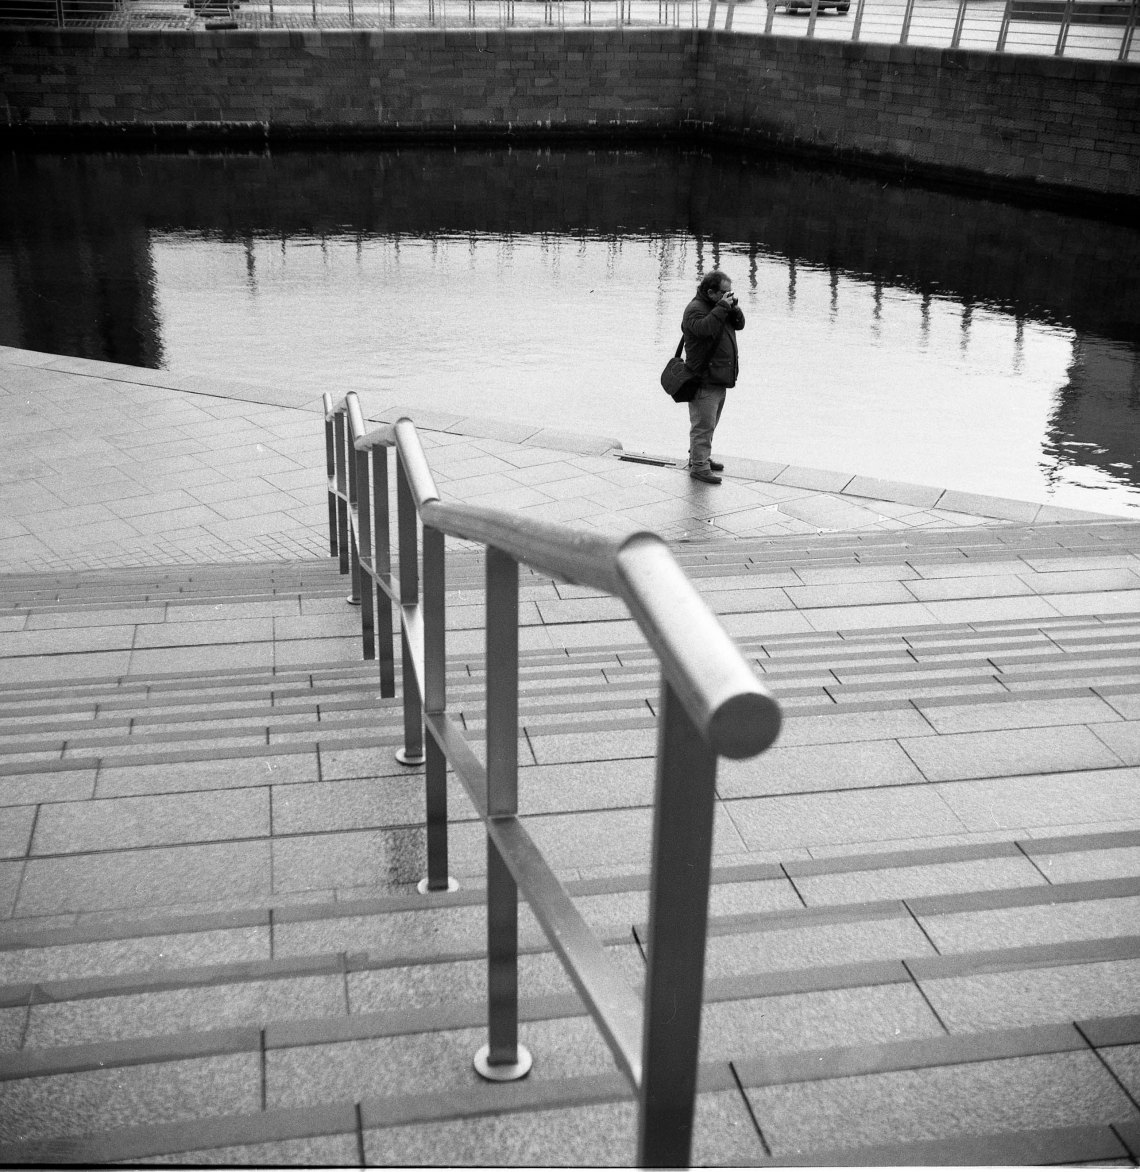 Docks #2